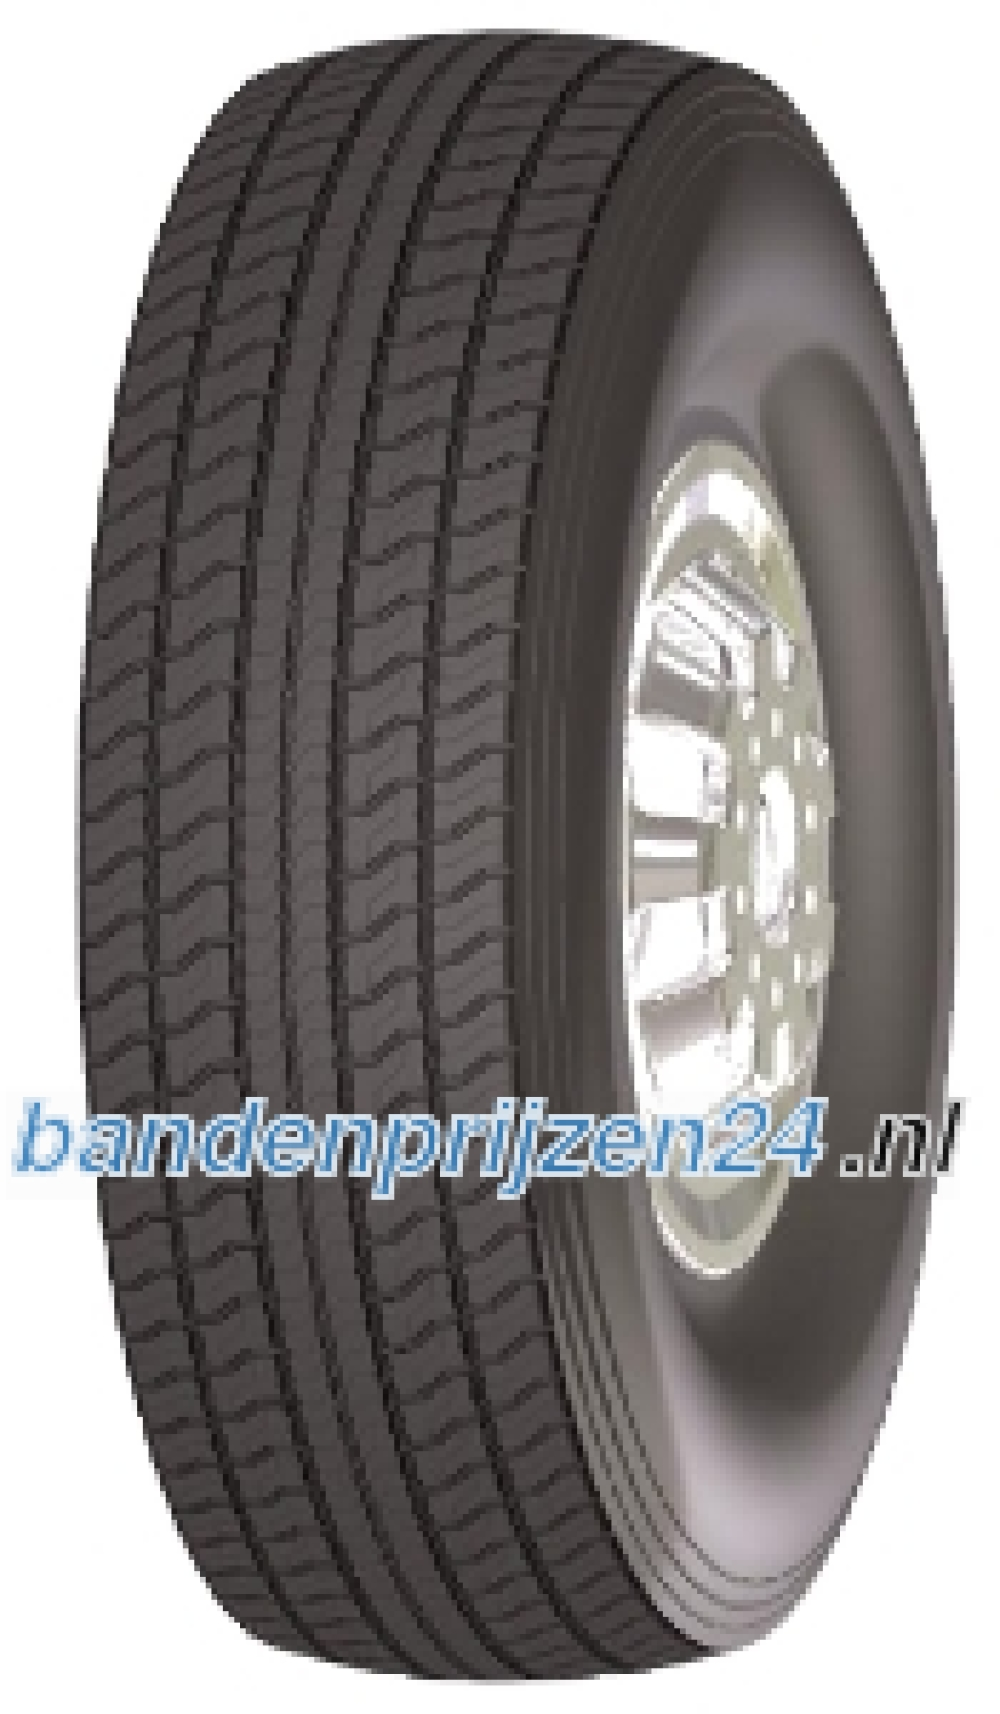 Kaltrunderneuerung K224 ( 275/70 R22.5 148/145J Karkassqualität NV, cover )